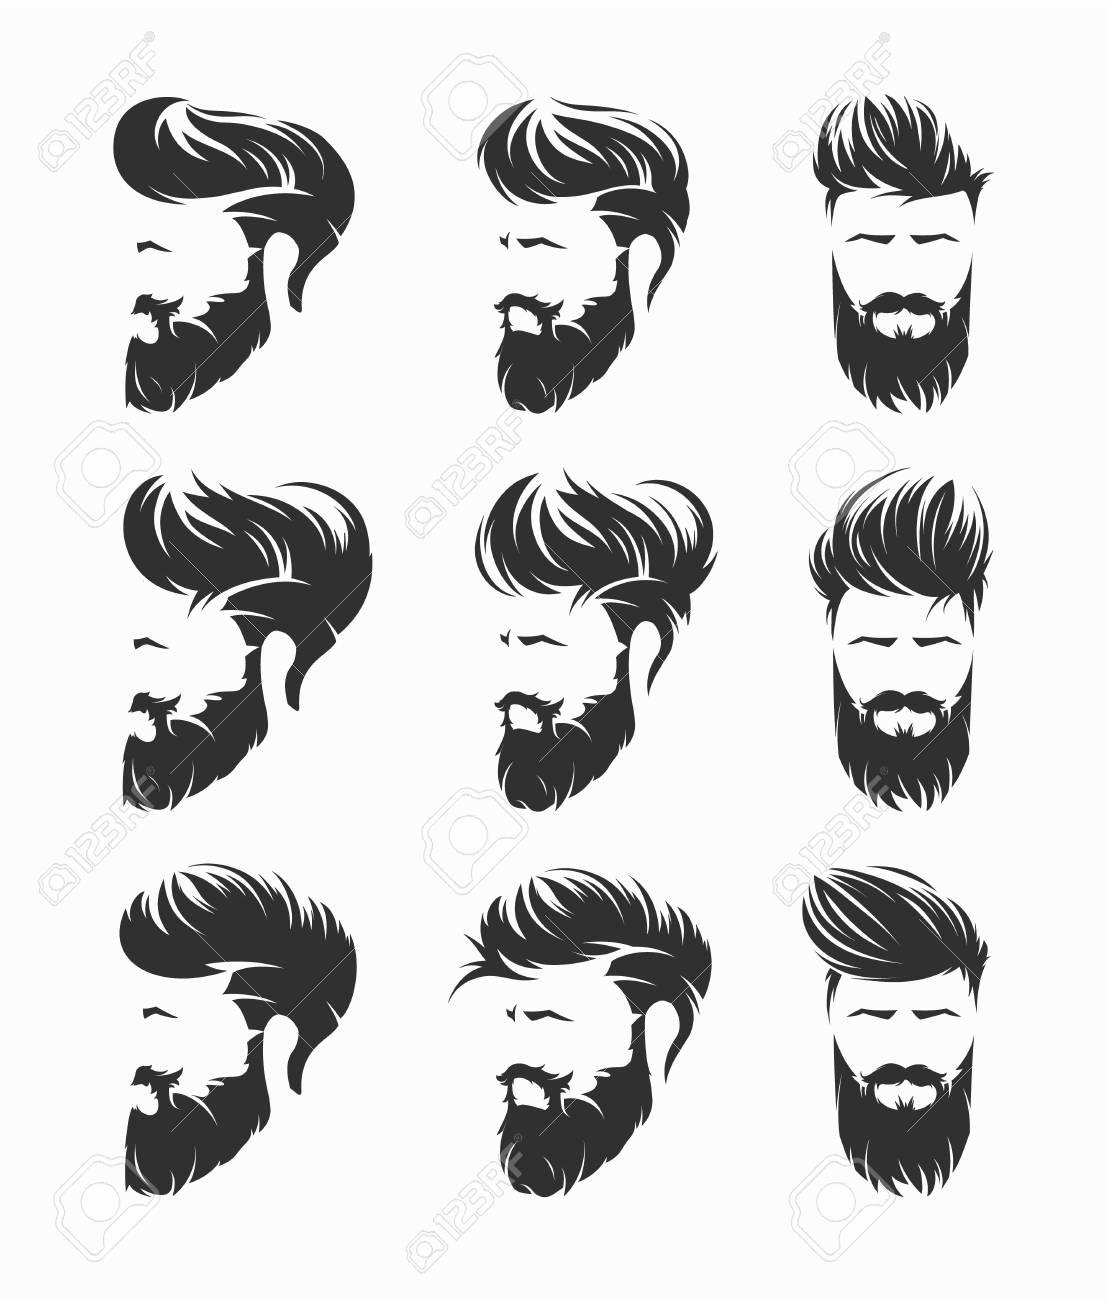 Mens Hairstyles Vector Set Royalty Free Cliparts Vectors And Stock